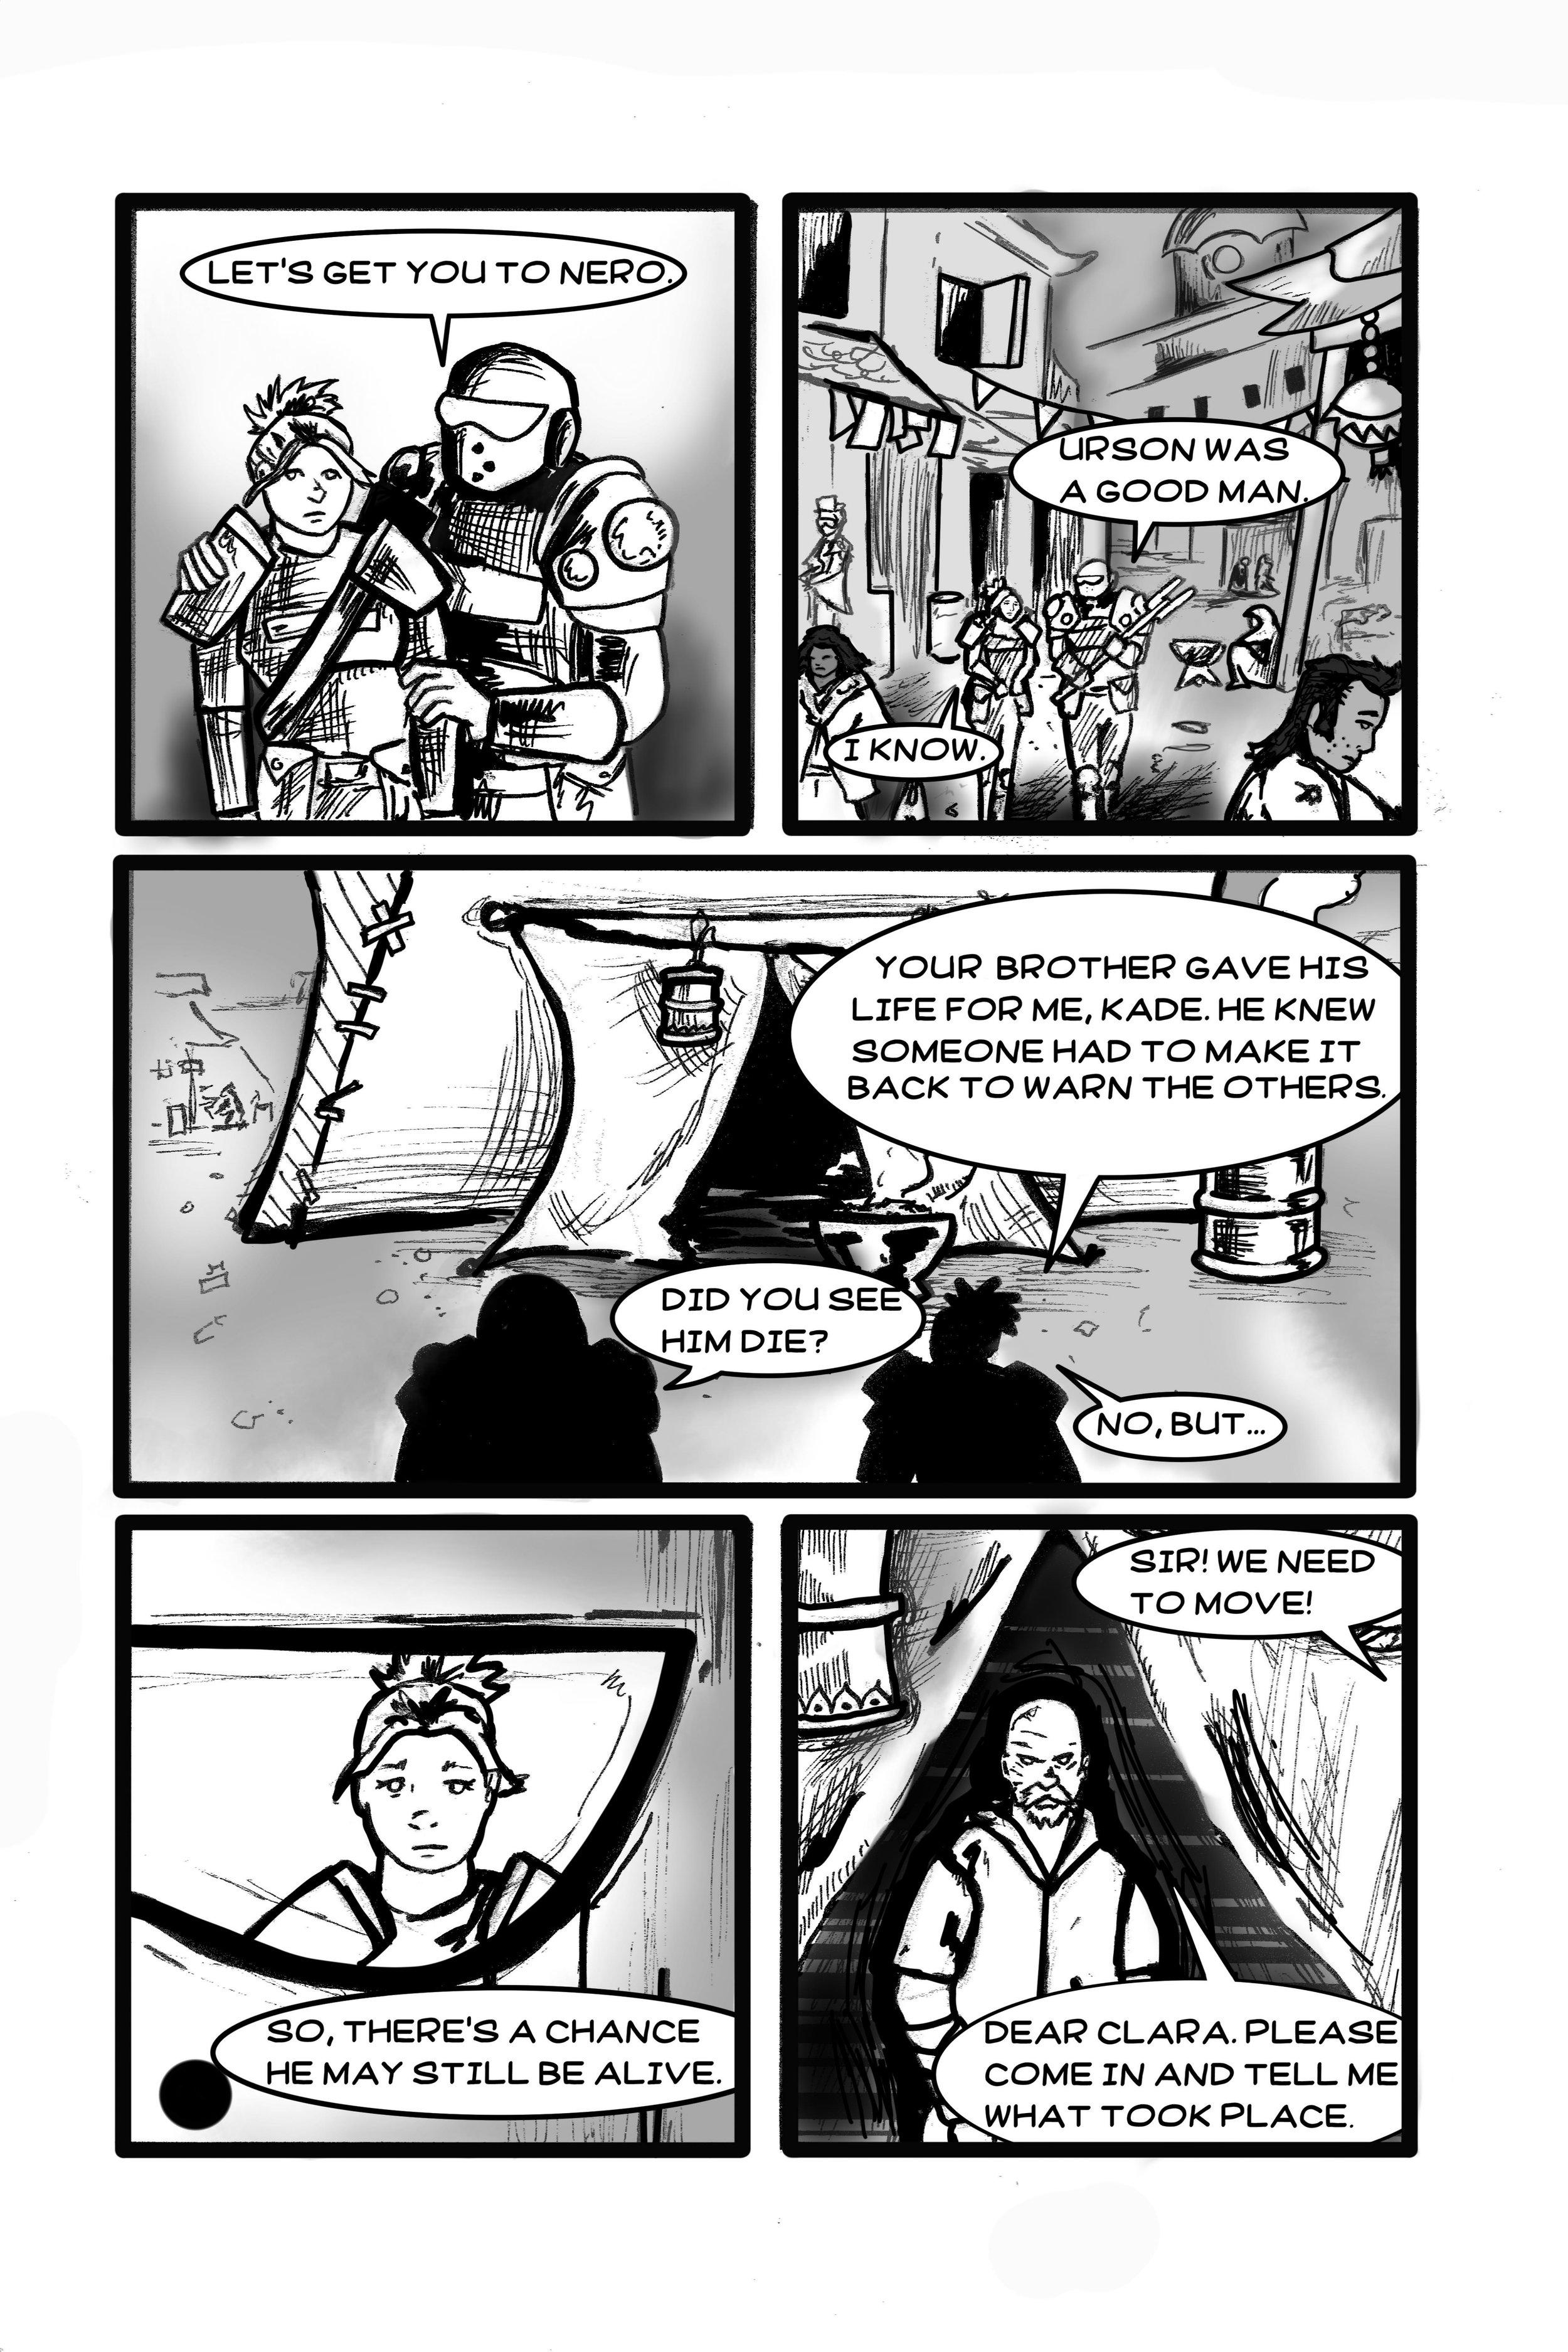 twh page17.jpg